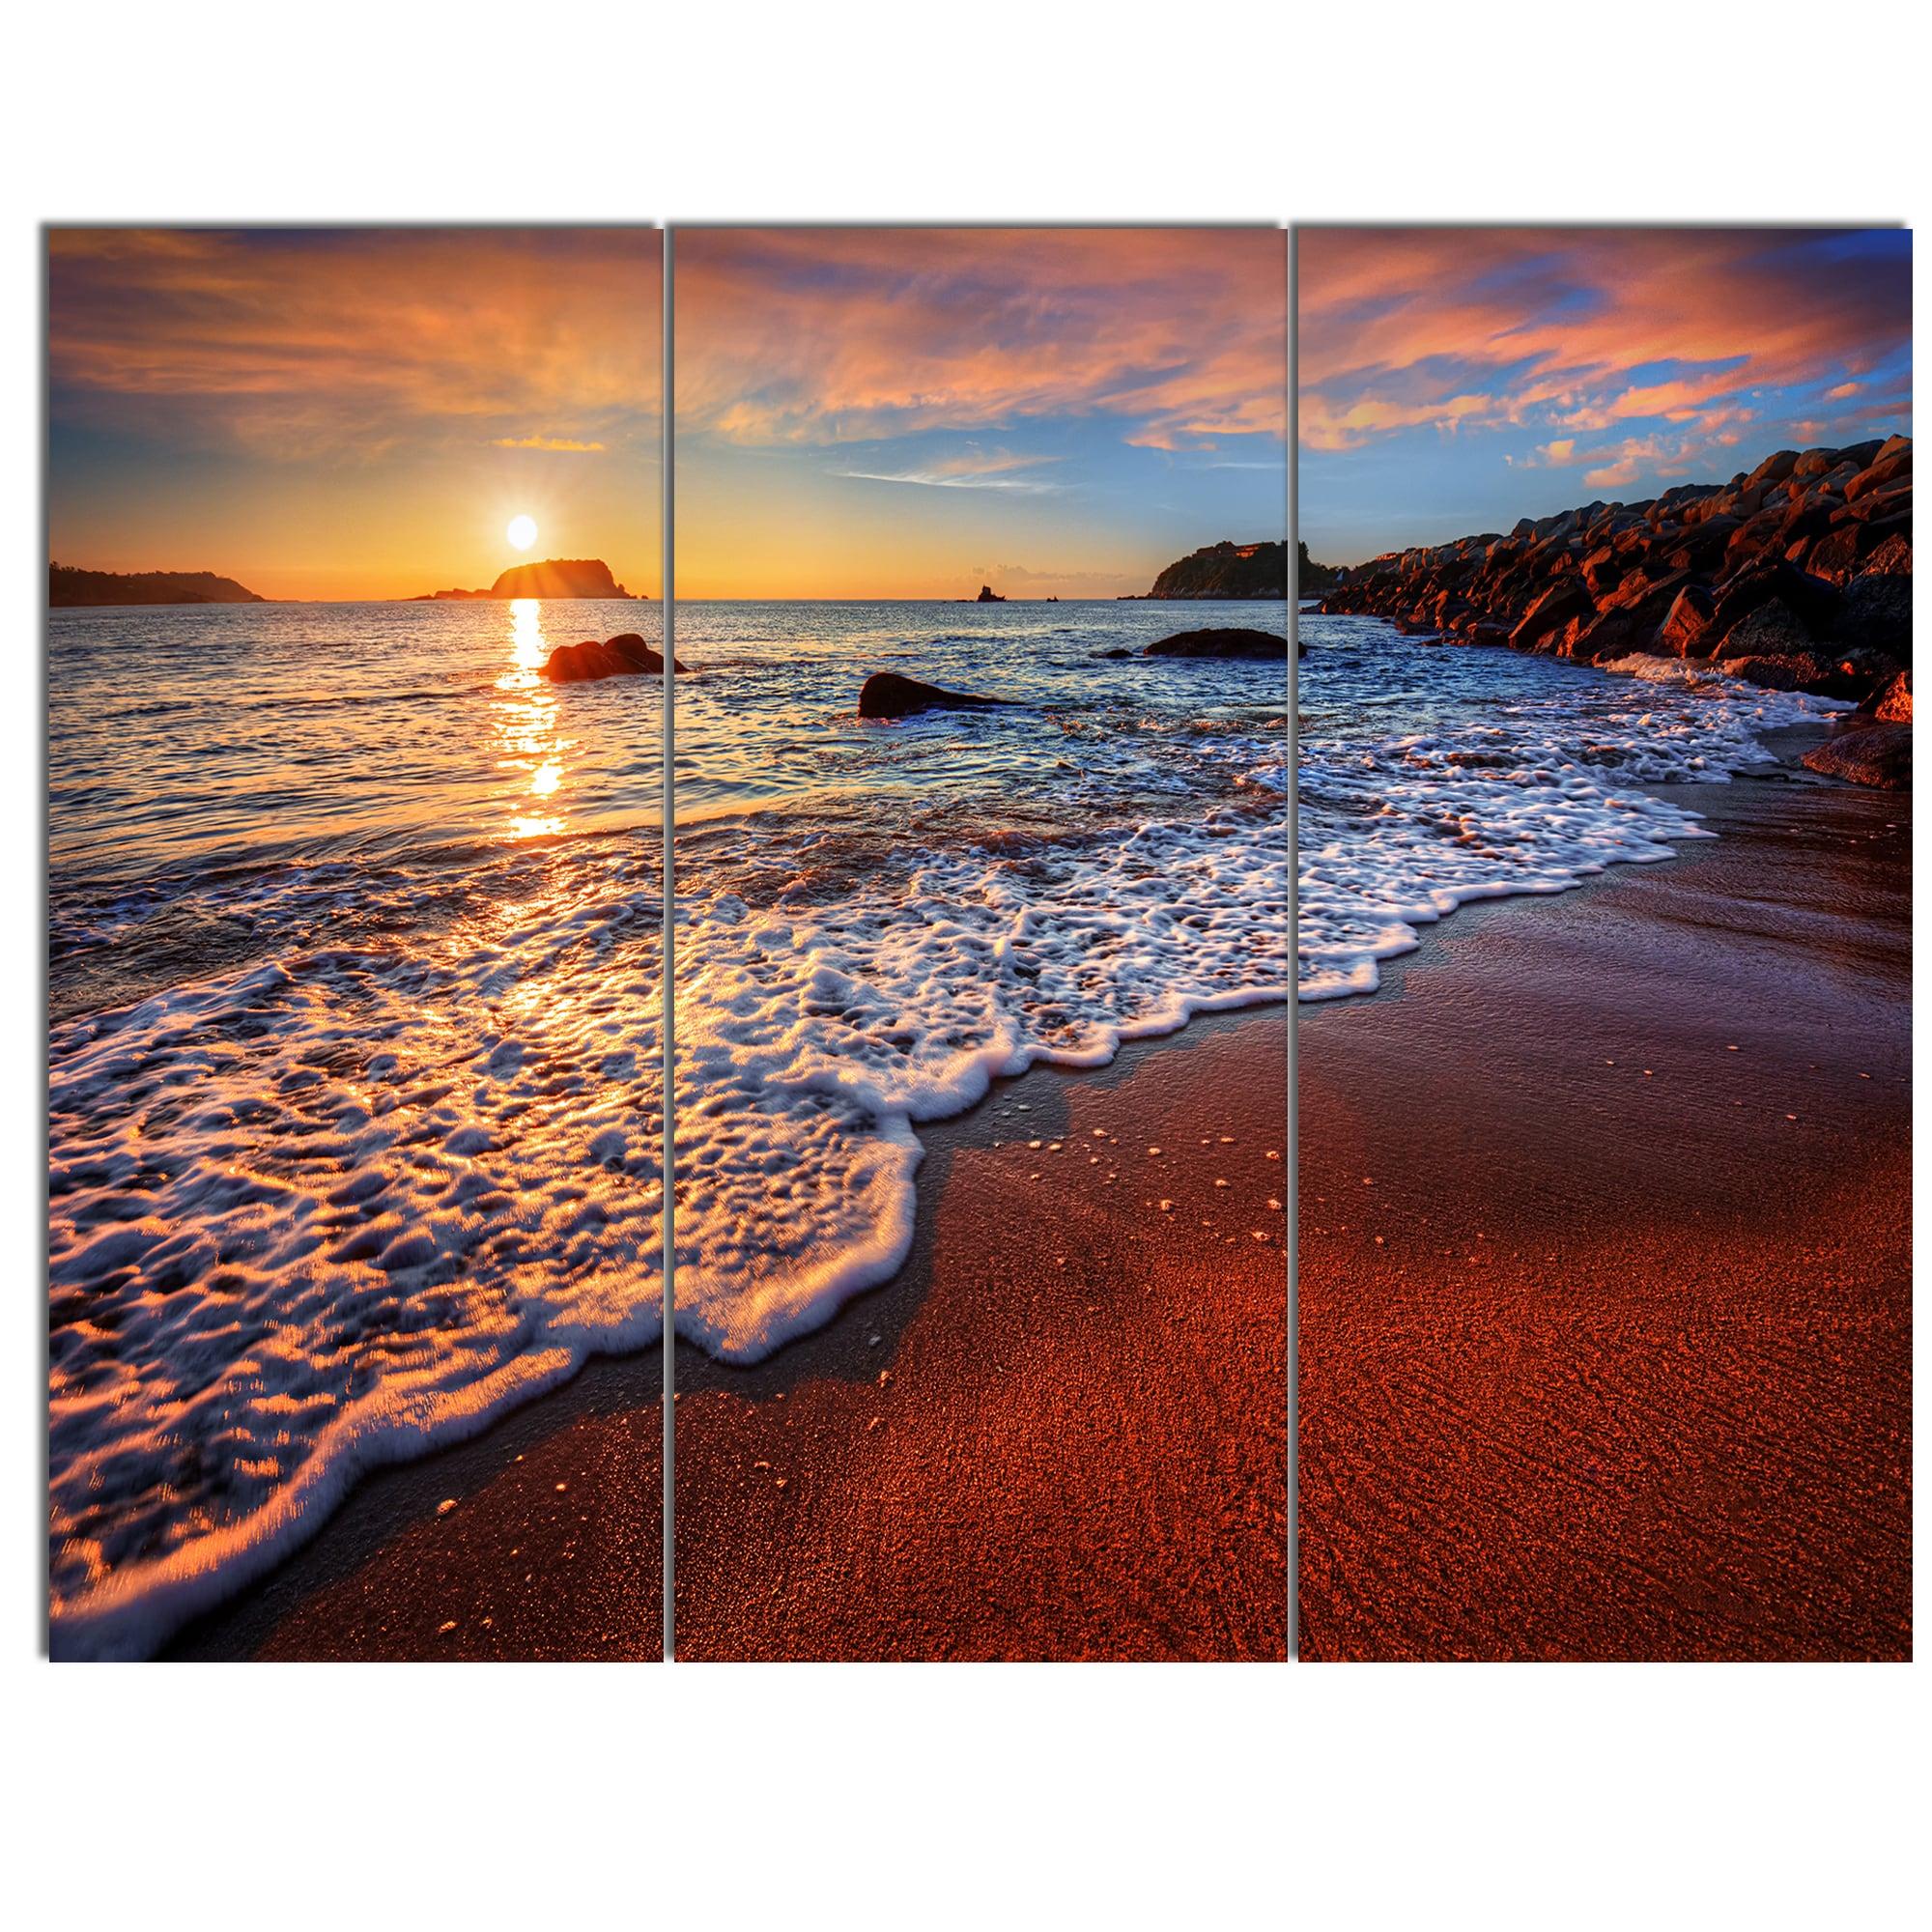 CANVAS ART PRINT STUNNING BEACH LANDSCAPE SEASCAPE A1